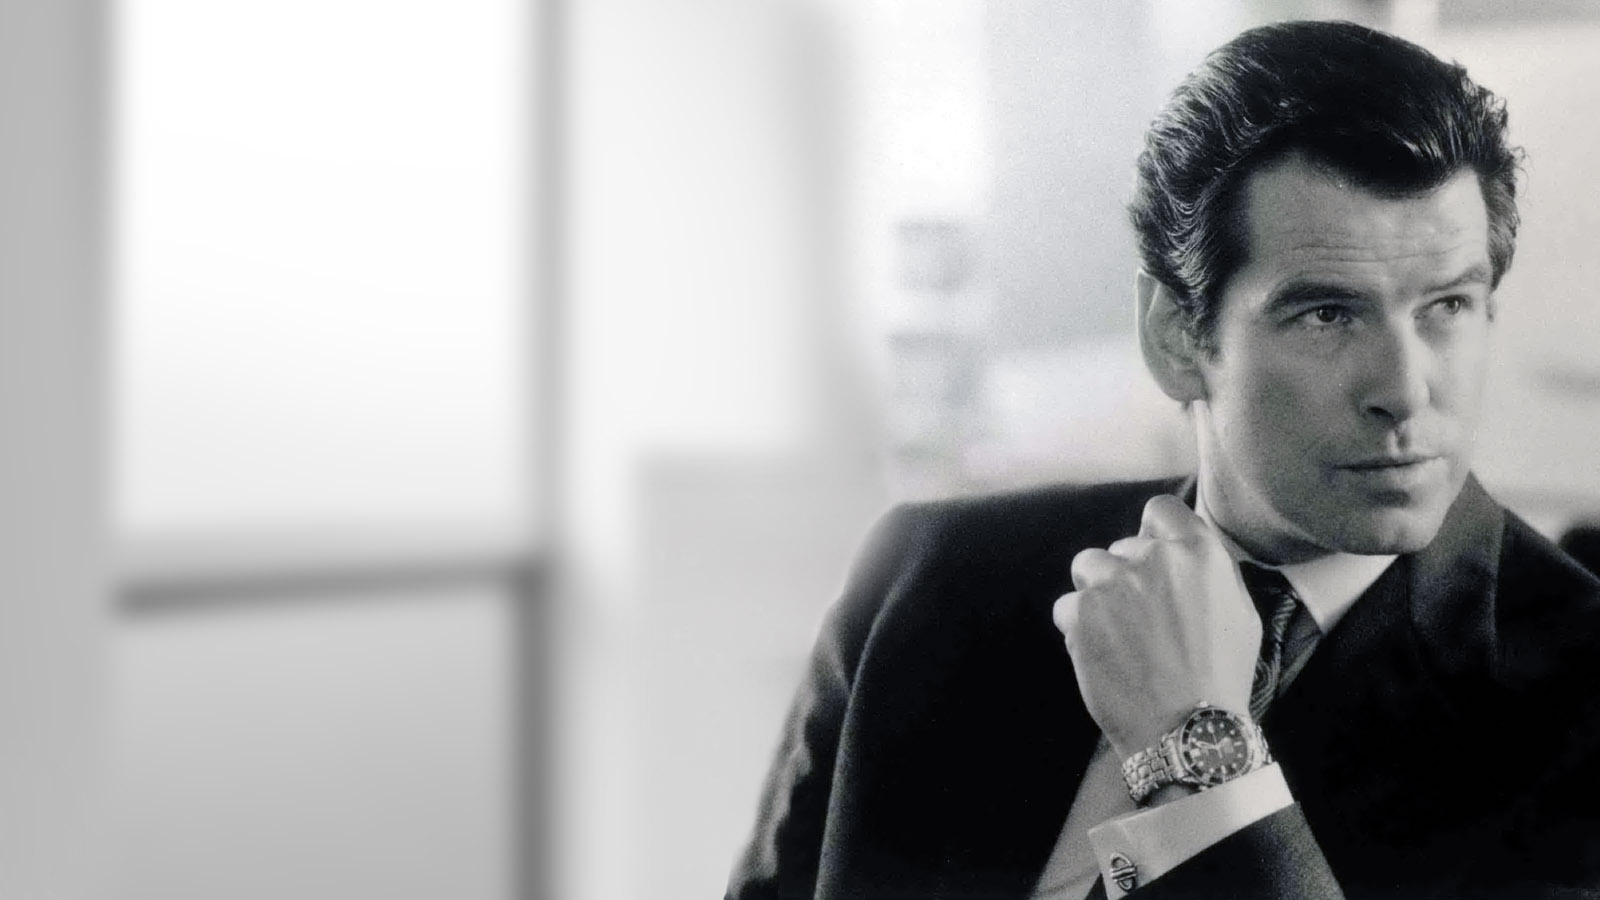 Pierce Brosnan as James Bond in  Tomorrow Never Dies  promotional images.